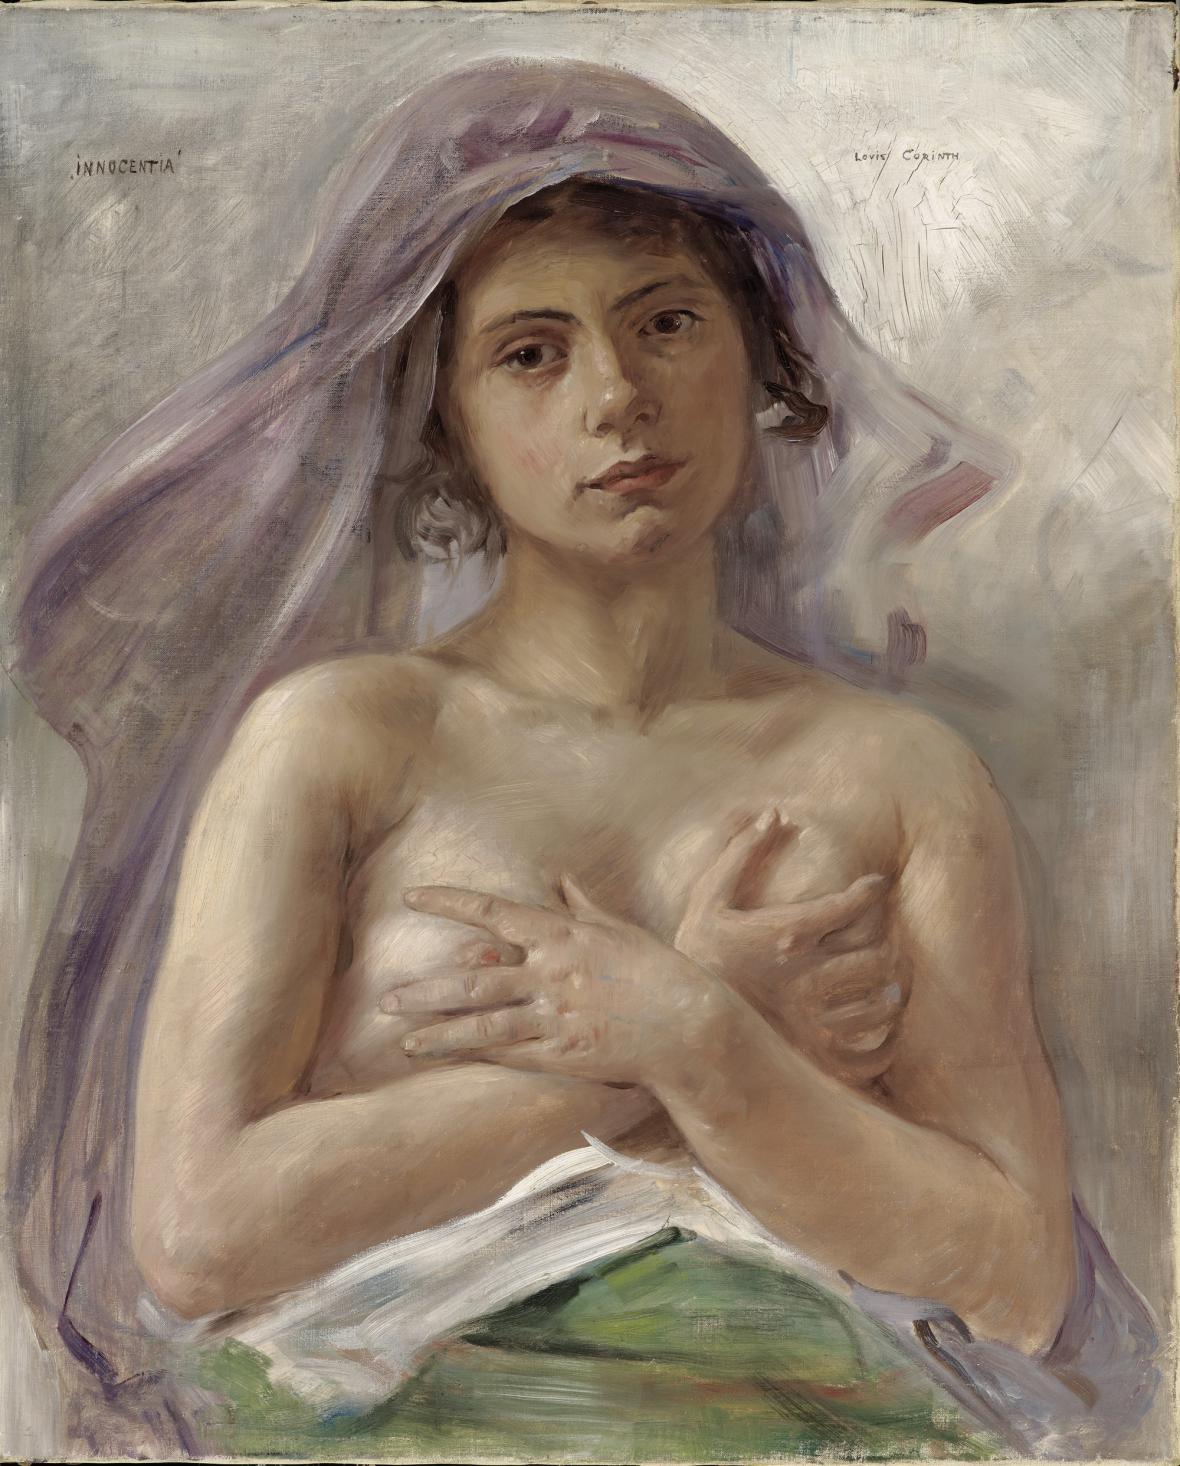 Lovis Corinth / Innocenta, 1890